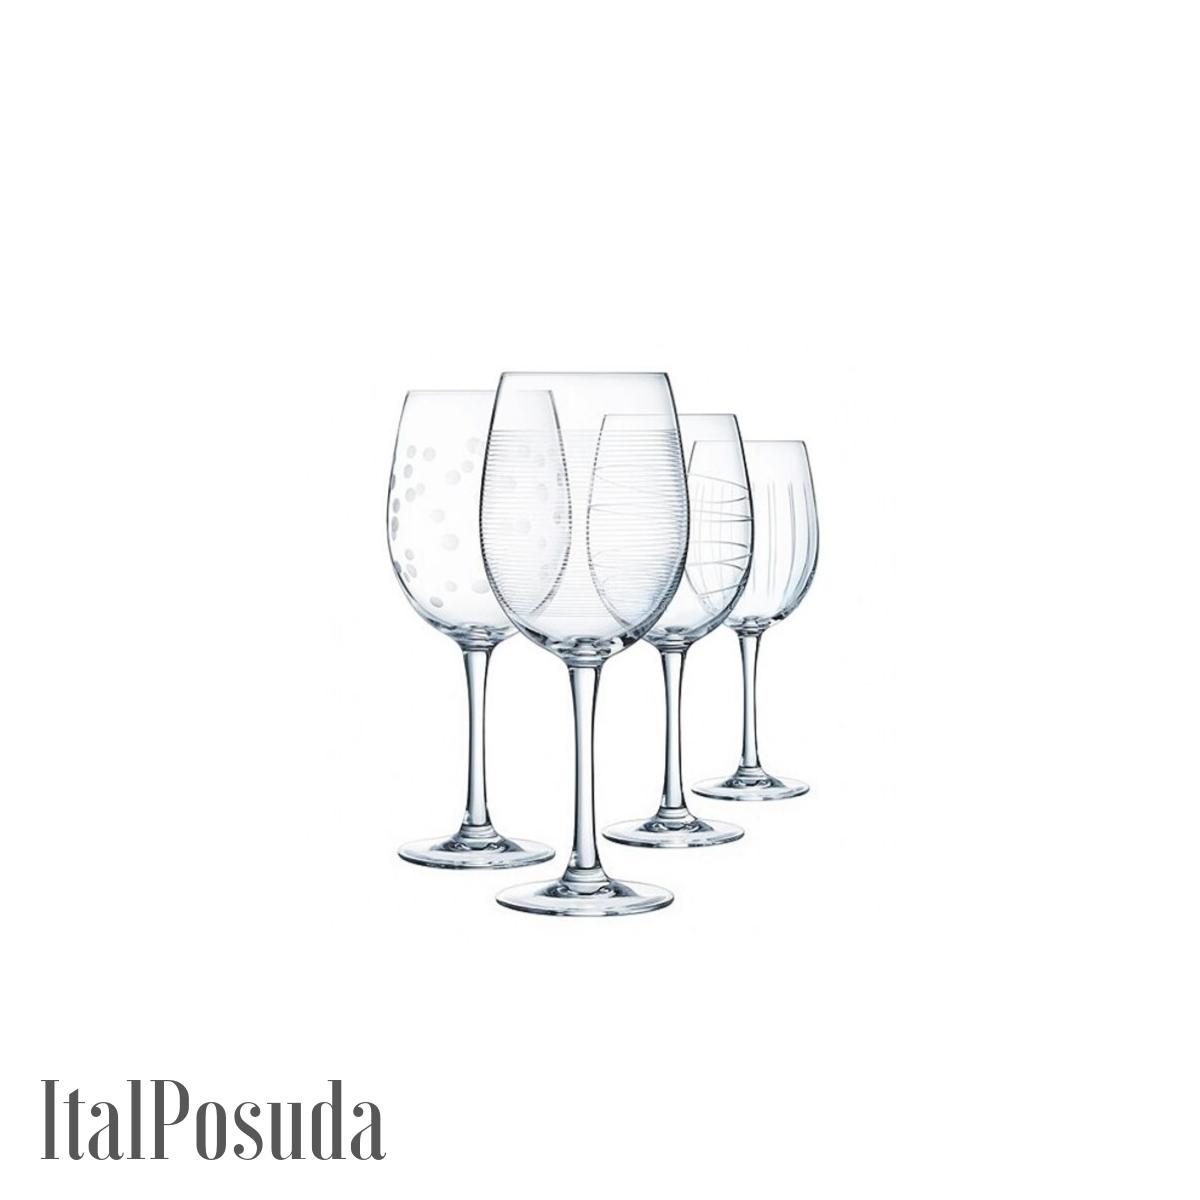 Набор бокалов для вина Eclat Cristal d'Arques Illumination Tulip (Иллюминейшн Тулип), 4 шт L7563